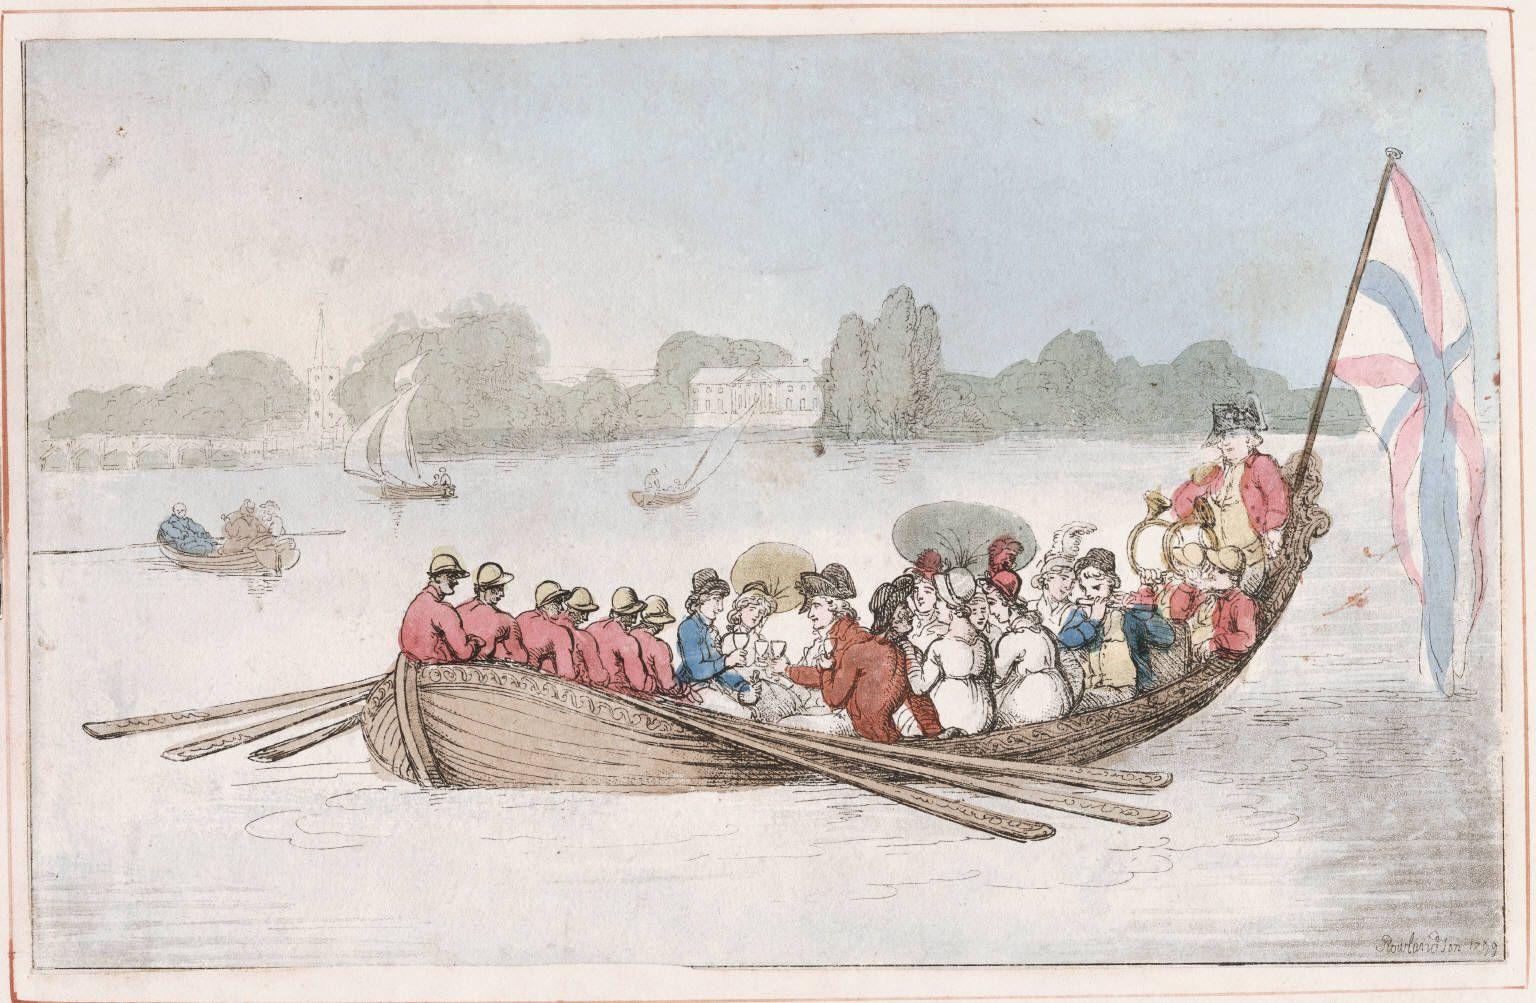 Rowlandson, Thomas, 1756-1827 Chelsea Reach Rowlandson 1799. [London? : s.n., 1799] Call Number: 799.09.00.02